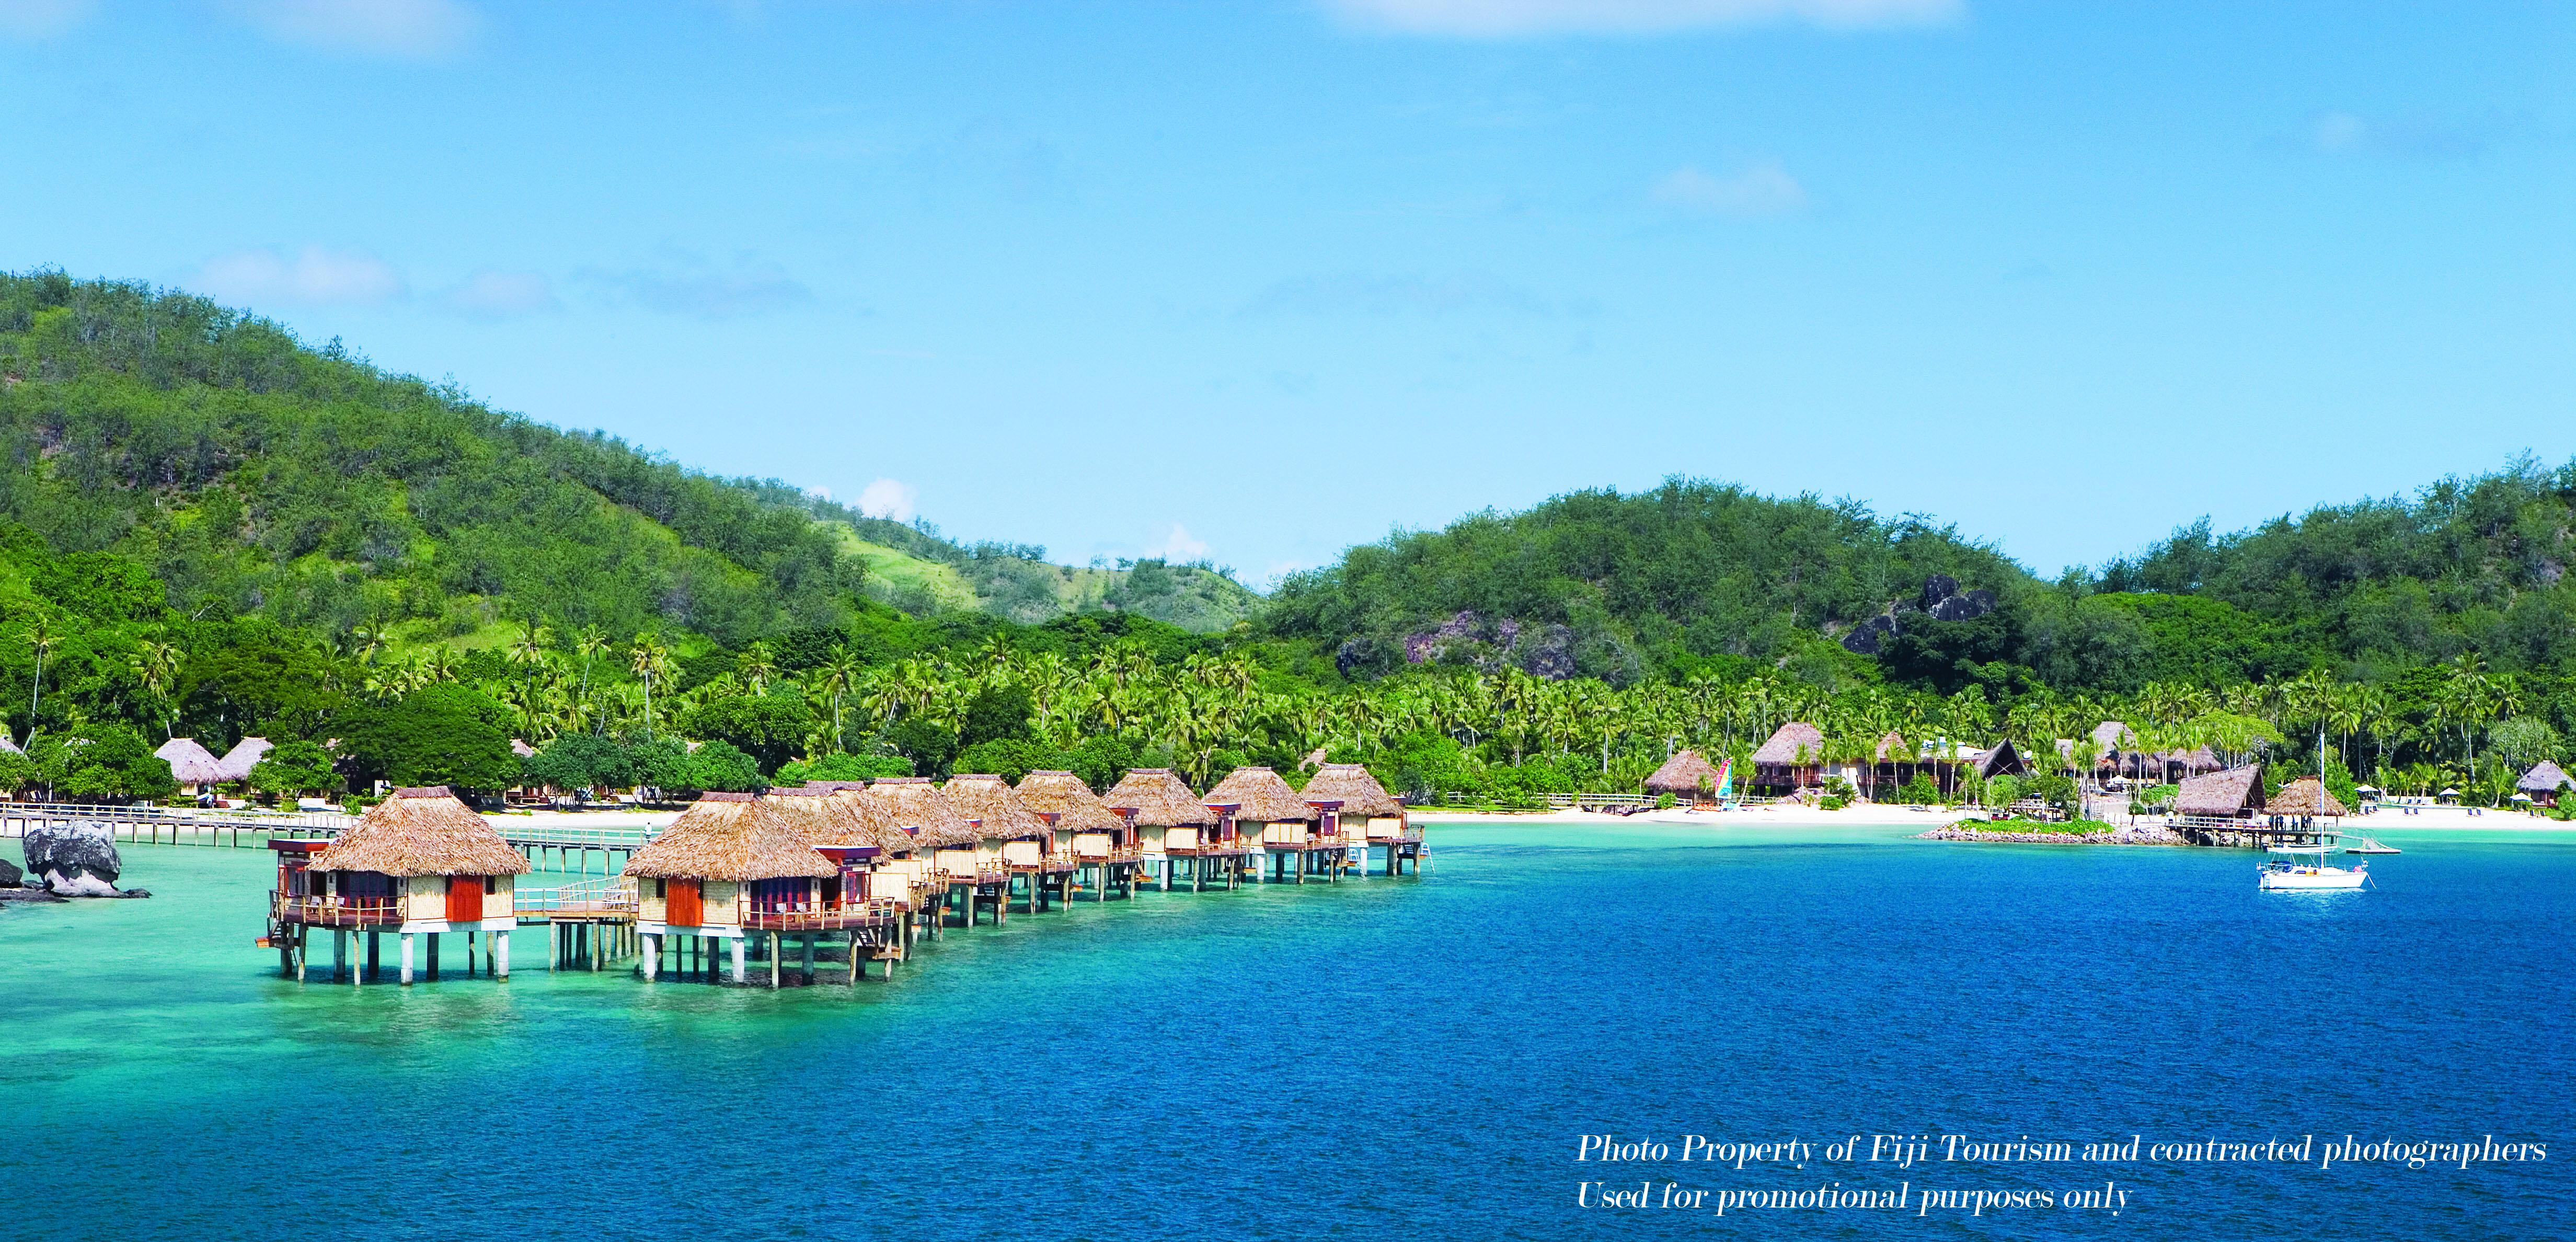 Fiji Precious Nuptials Amp Destinations Honeymoon And